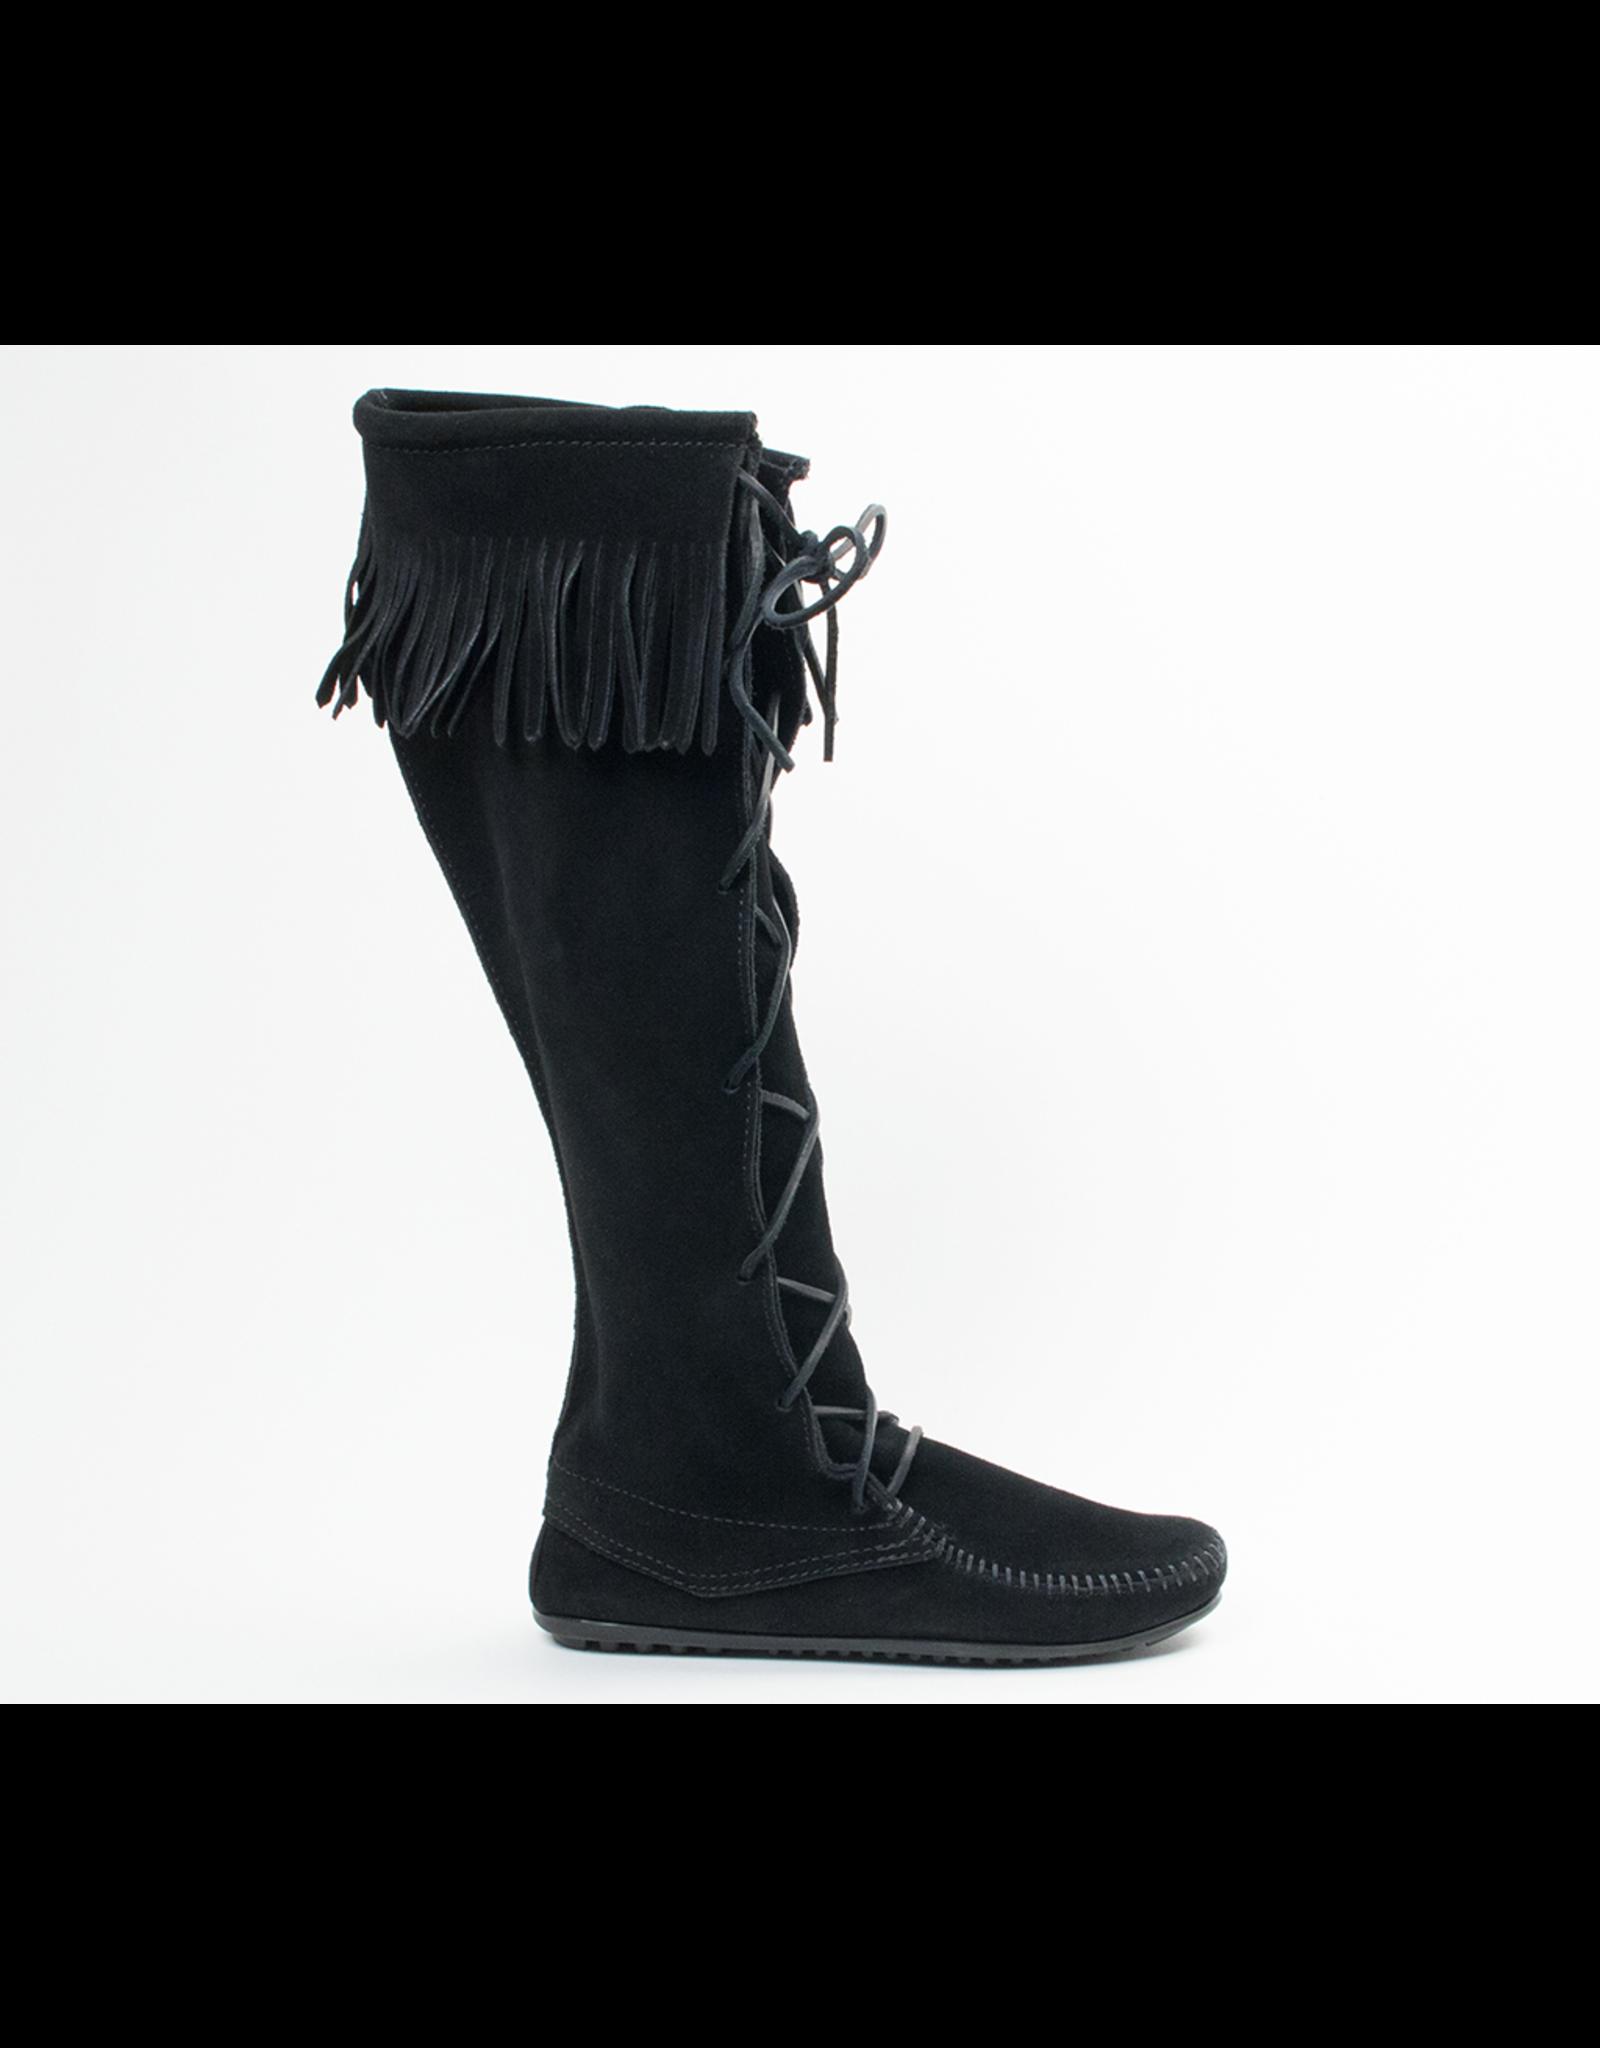 Minnetonka Front Lace Hard Sole Knee Hi Boot - COV513